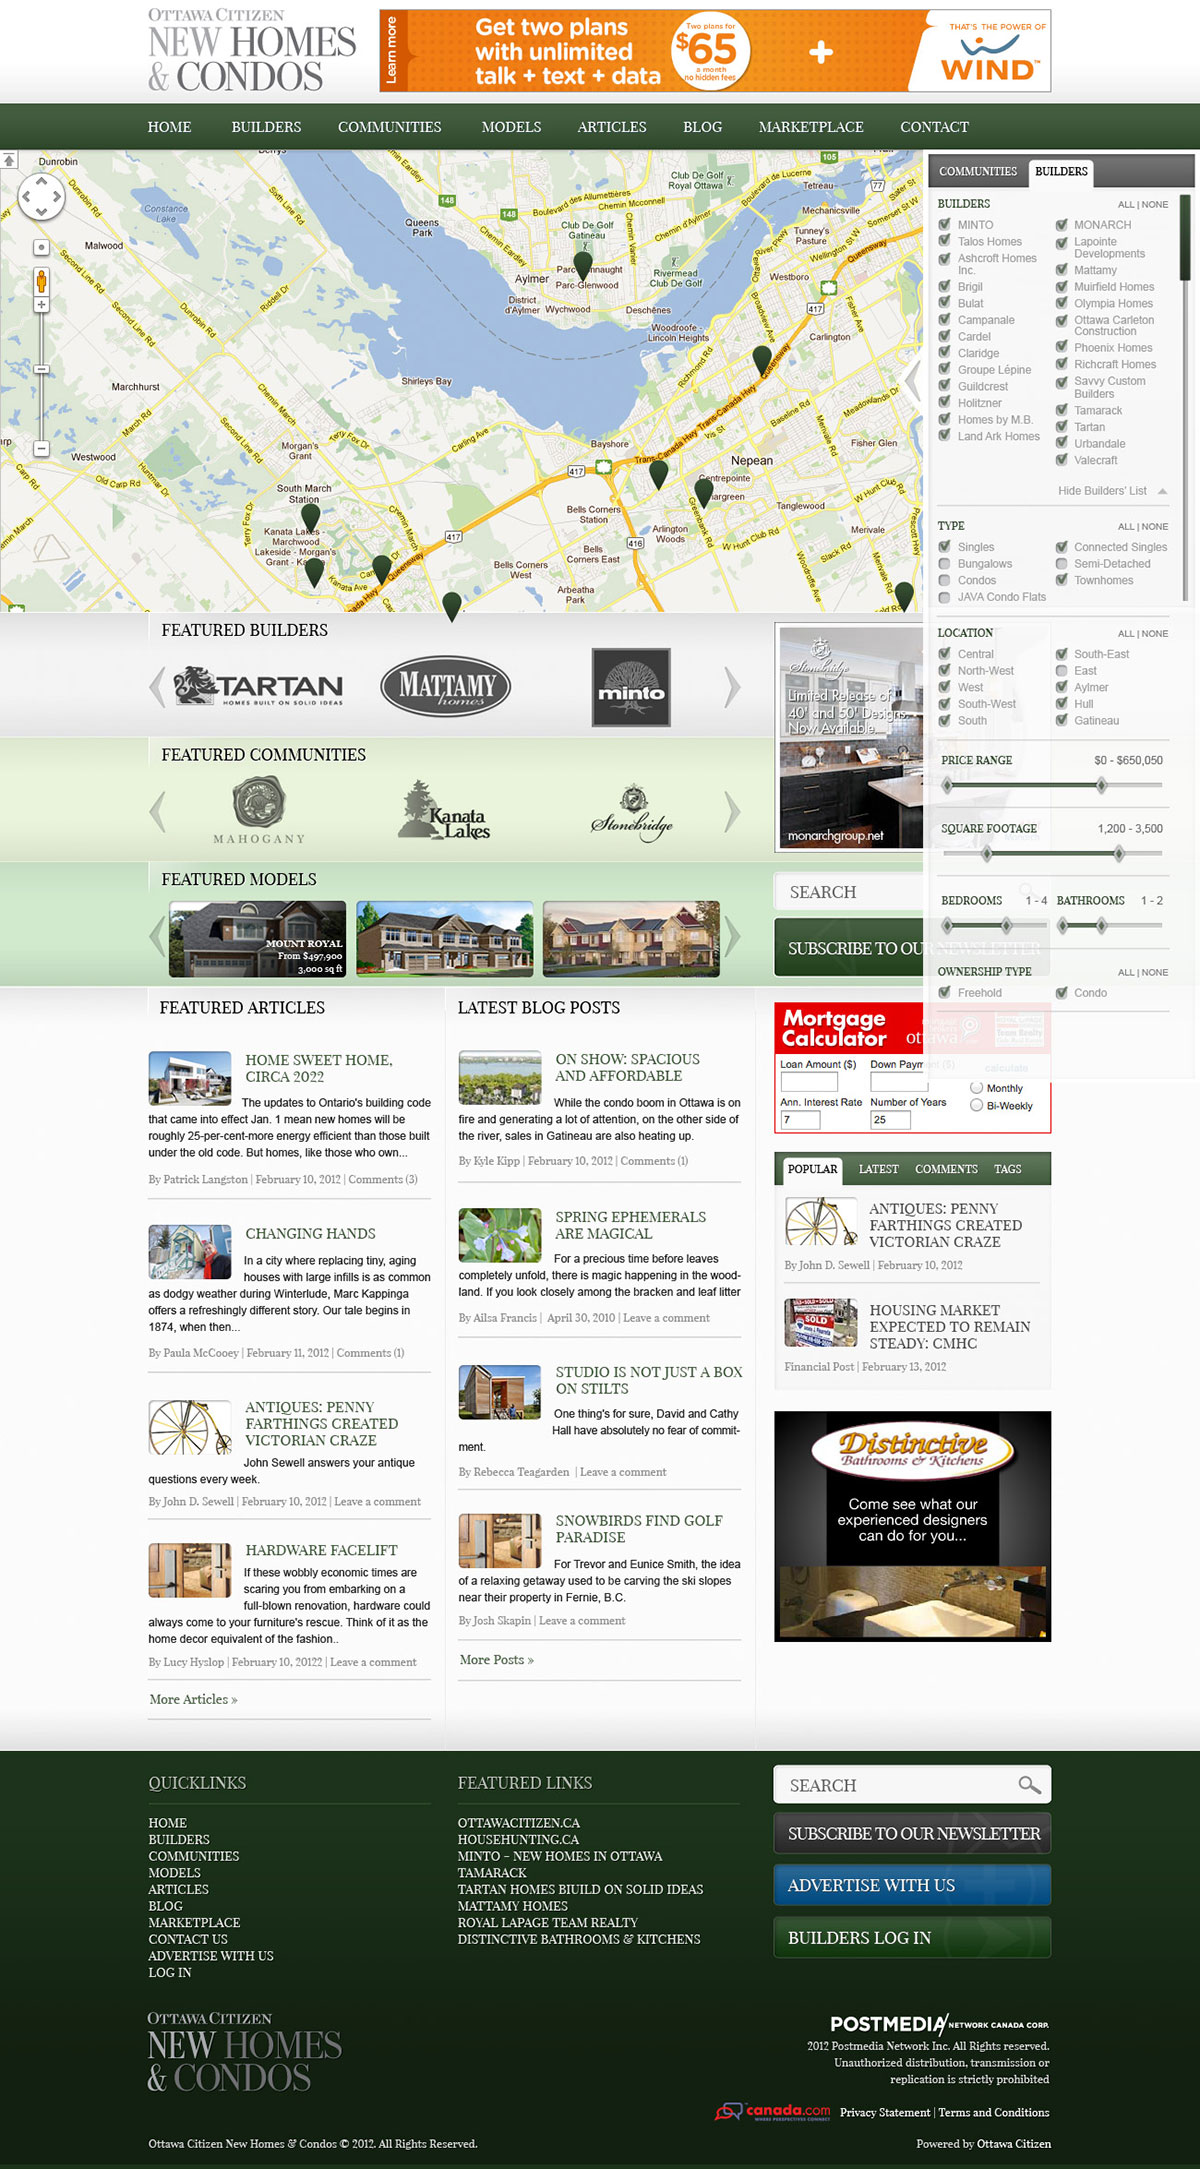 new_homes_website_v3_1_3_open_tab